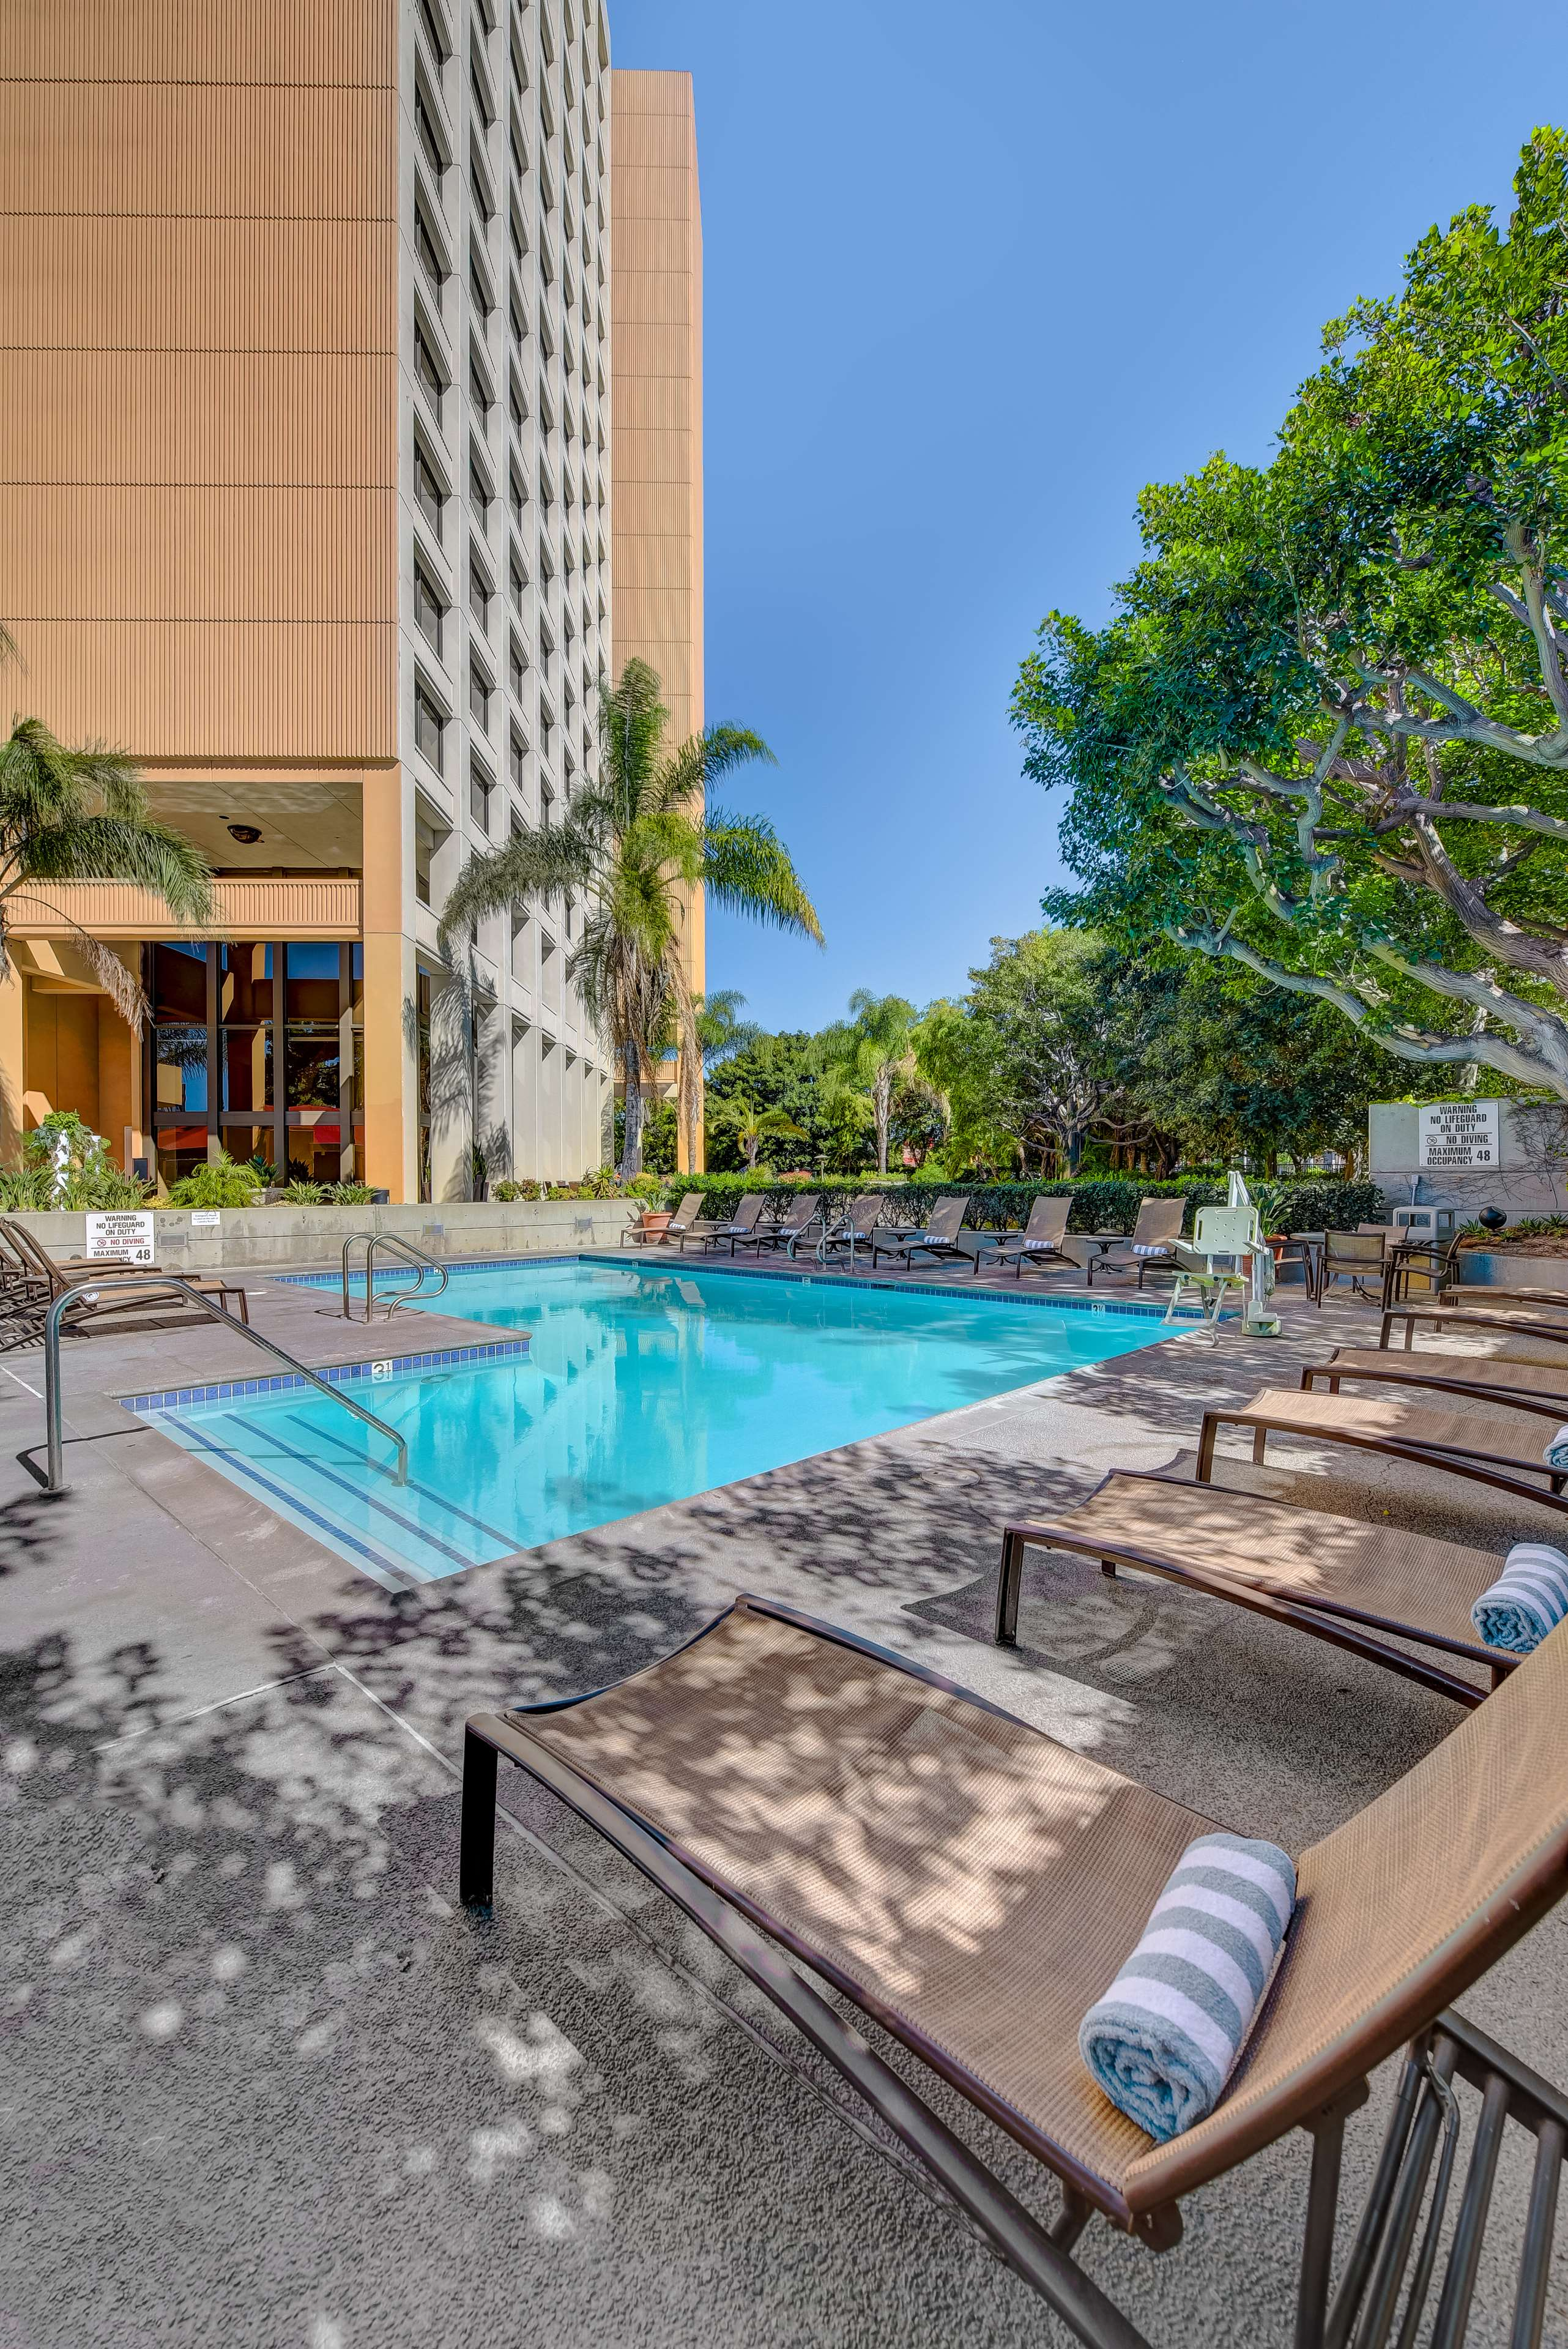 DoubleTree by Hilton Hotel Anaheim - Orange County image 18